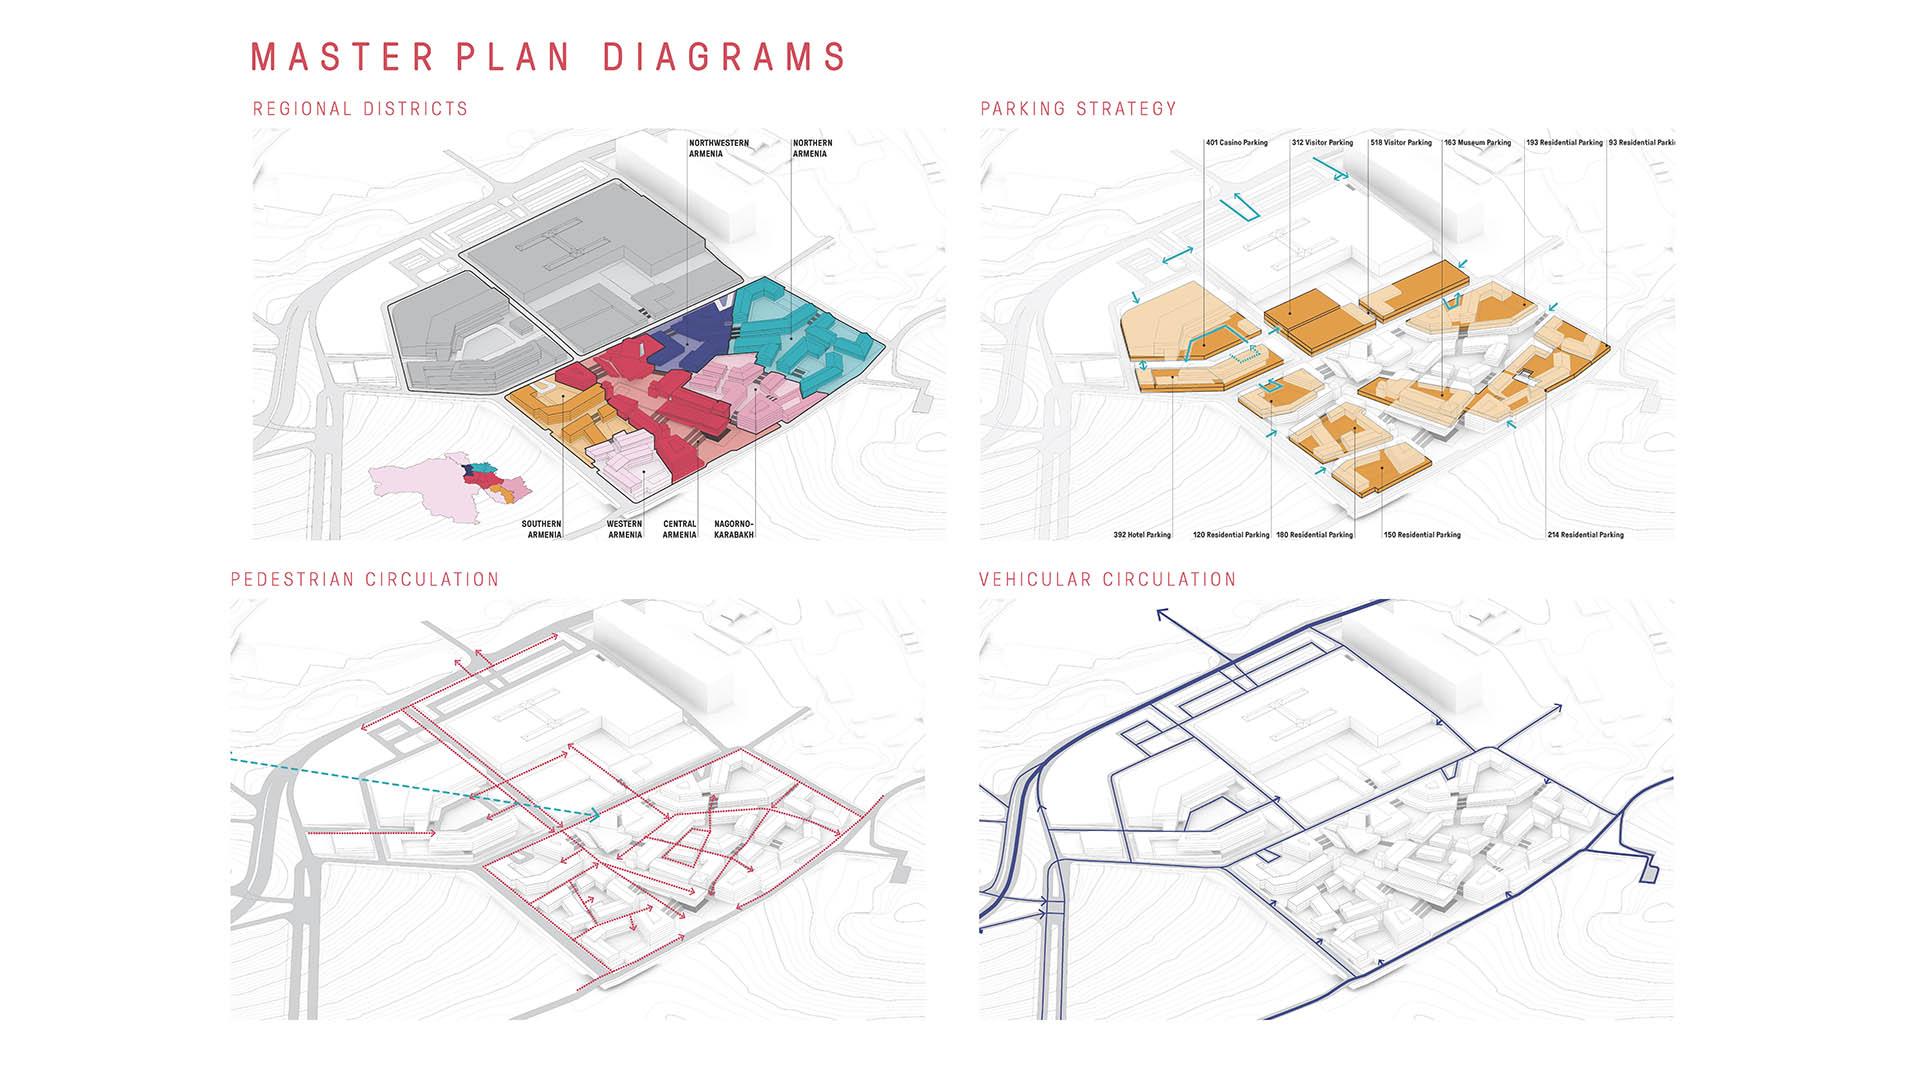 hight resolution of master plan diagrams